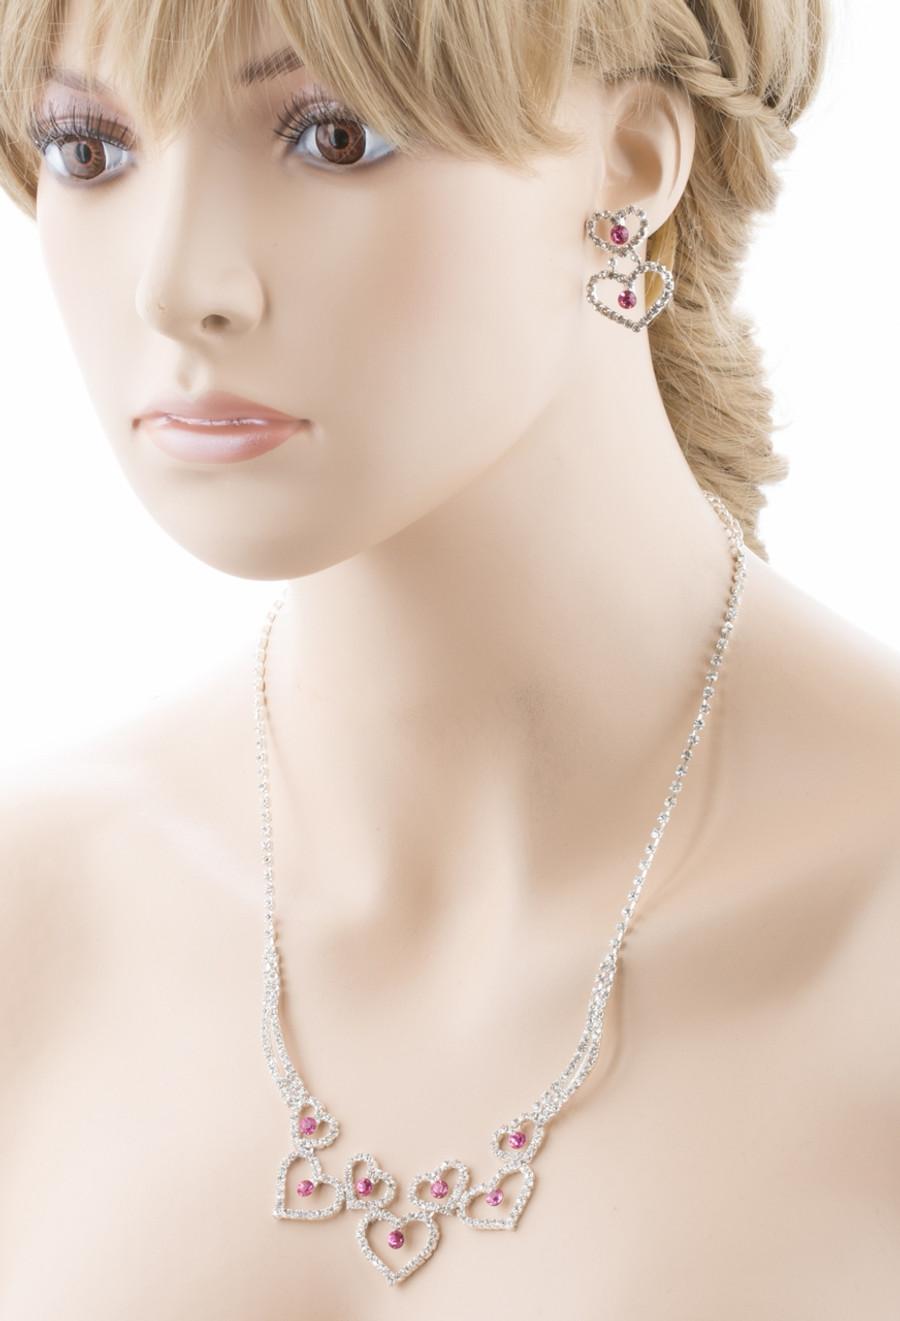 Valentines Jewelry Bridal Wedding Prom Fashion Heart Link Necklace Set J467 Pink